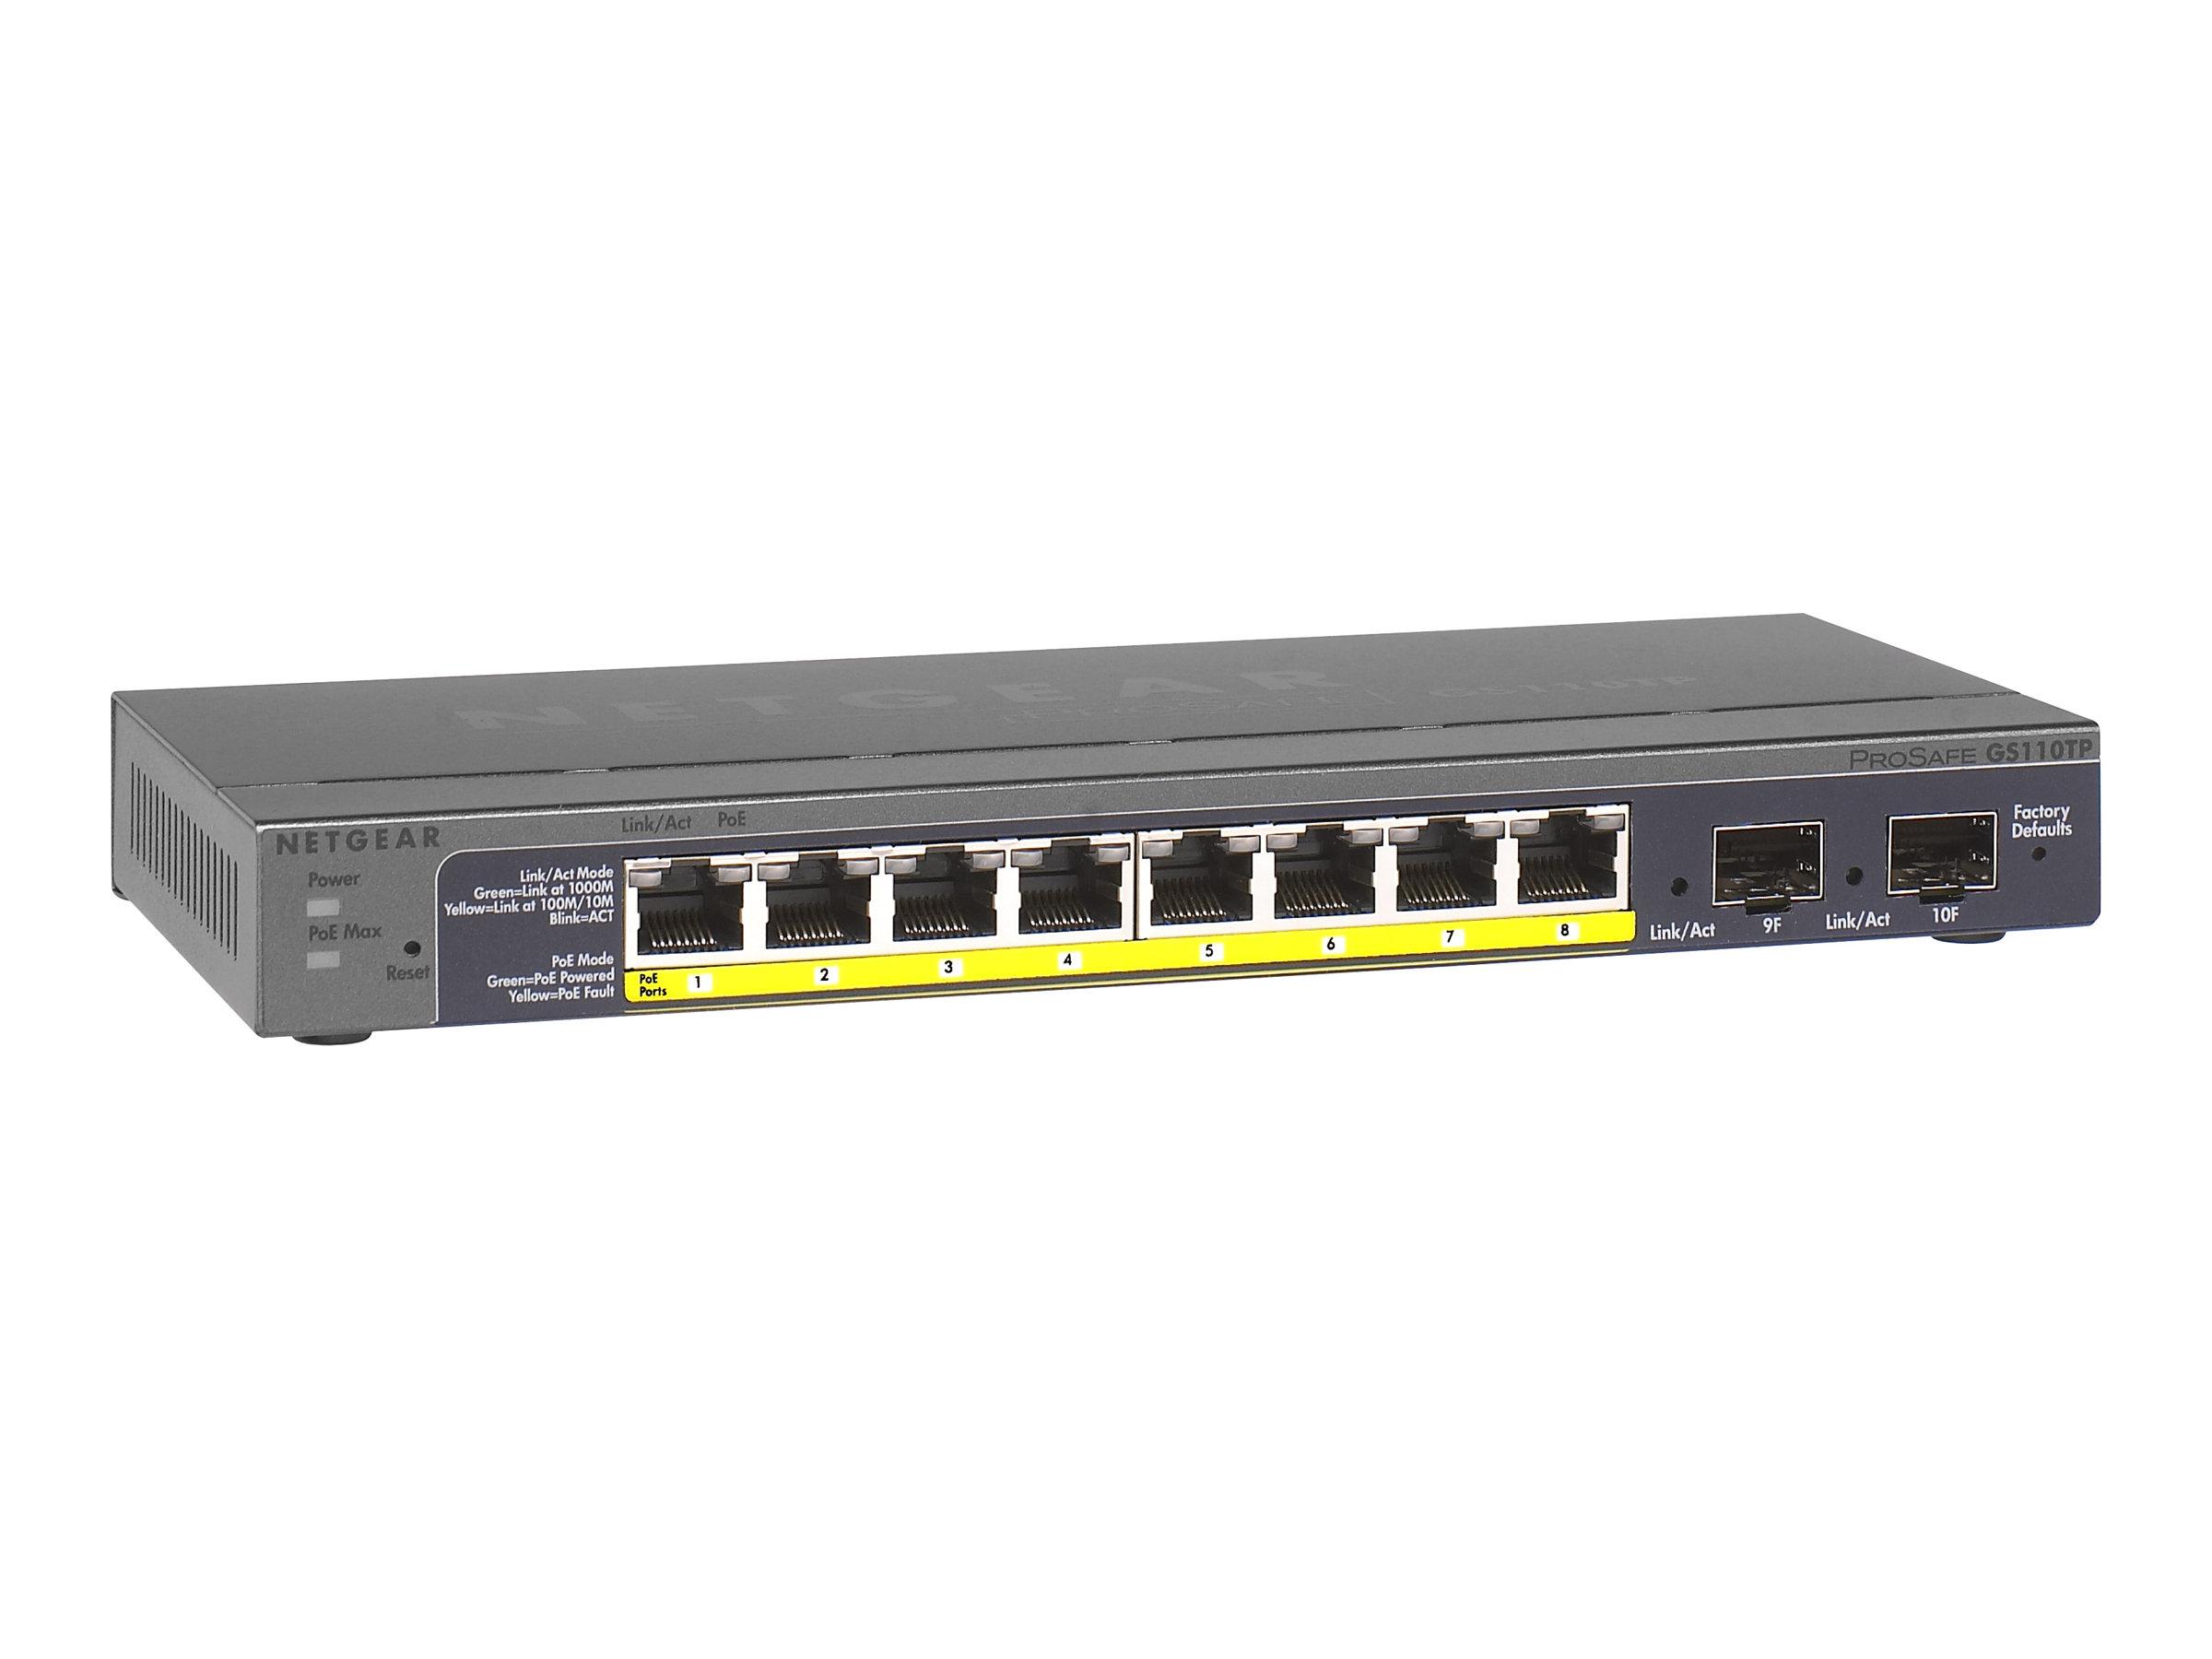 Netgear GS110TP - Switch - managed - 8 x 10/100/1000 (PoE)